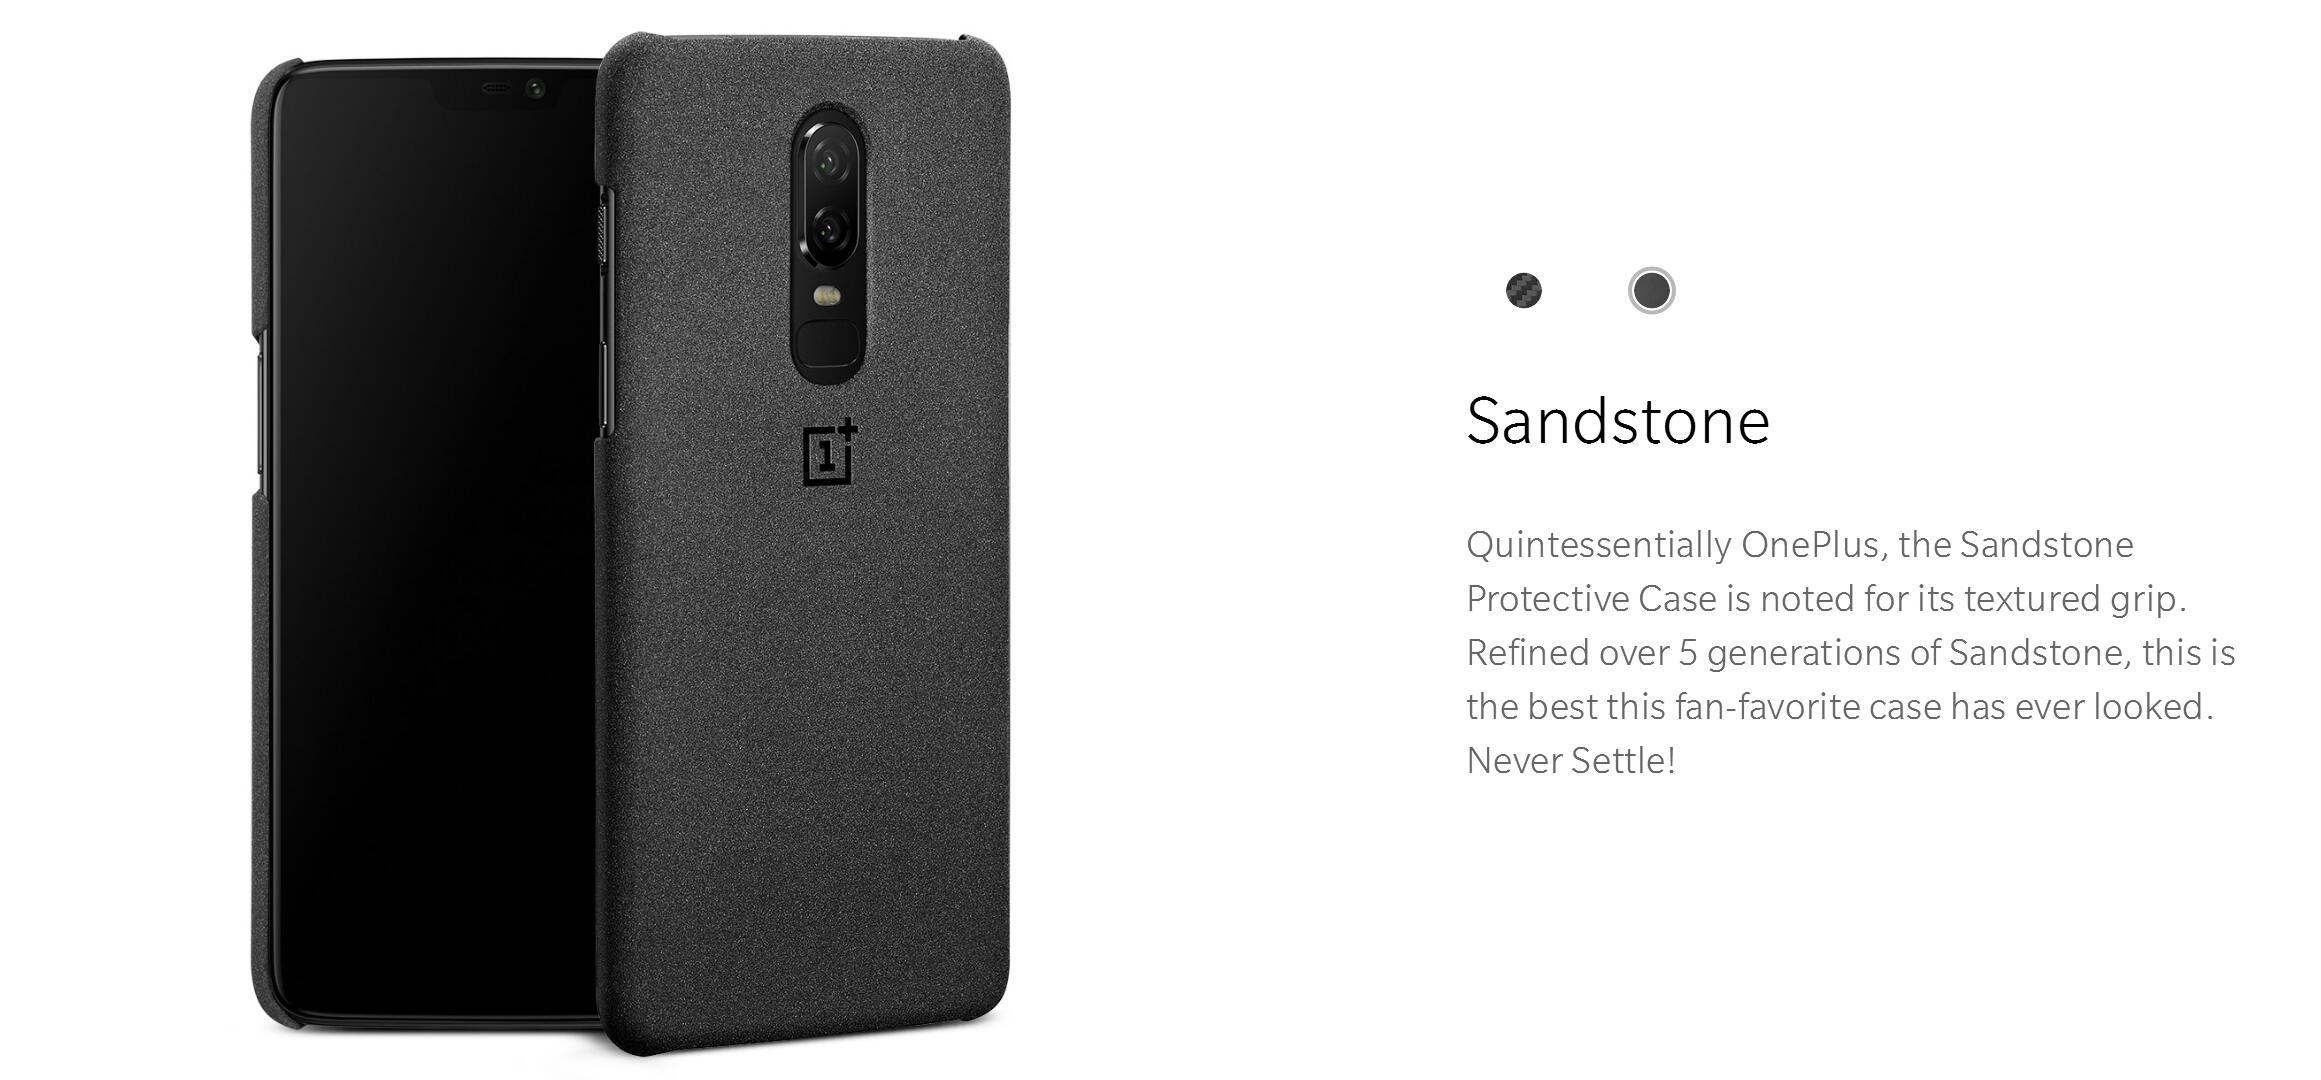 OnePlus 6 Protective Case